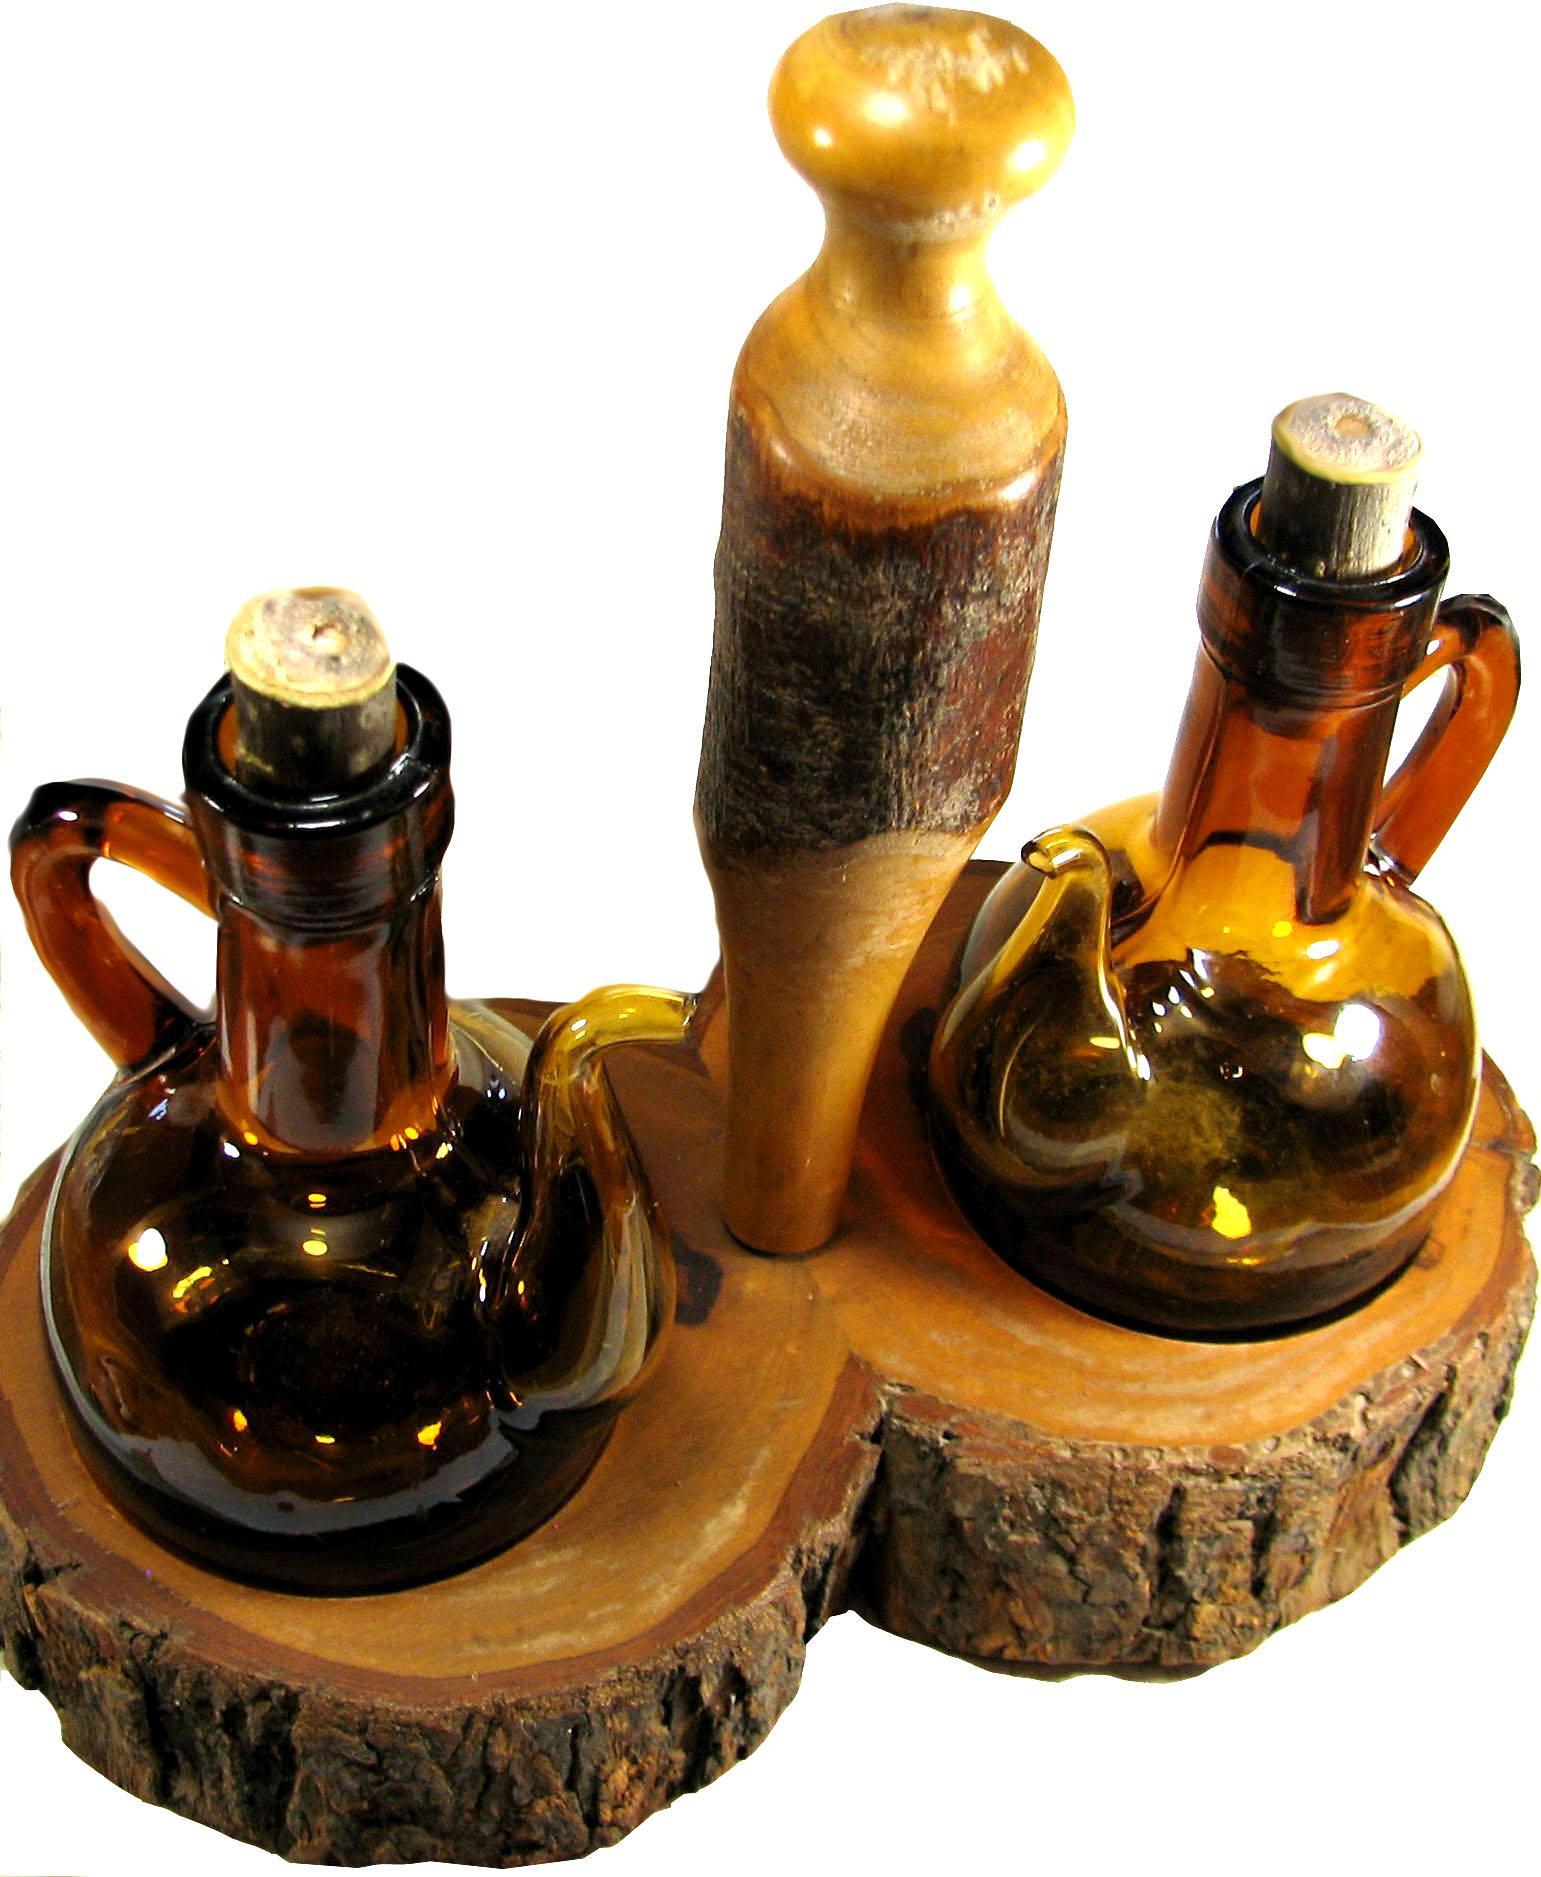 vintage kitchenware egg beaters scales bottle openers oliv art mallorka vintage cruet castor set wood base brown bubble glass